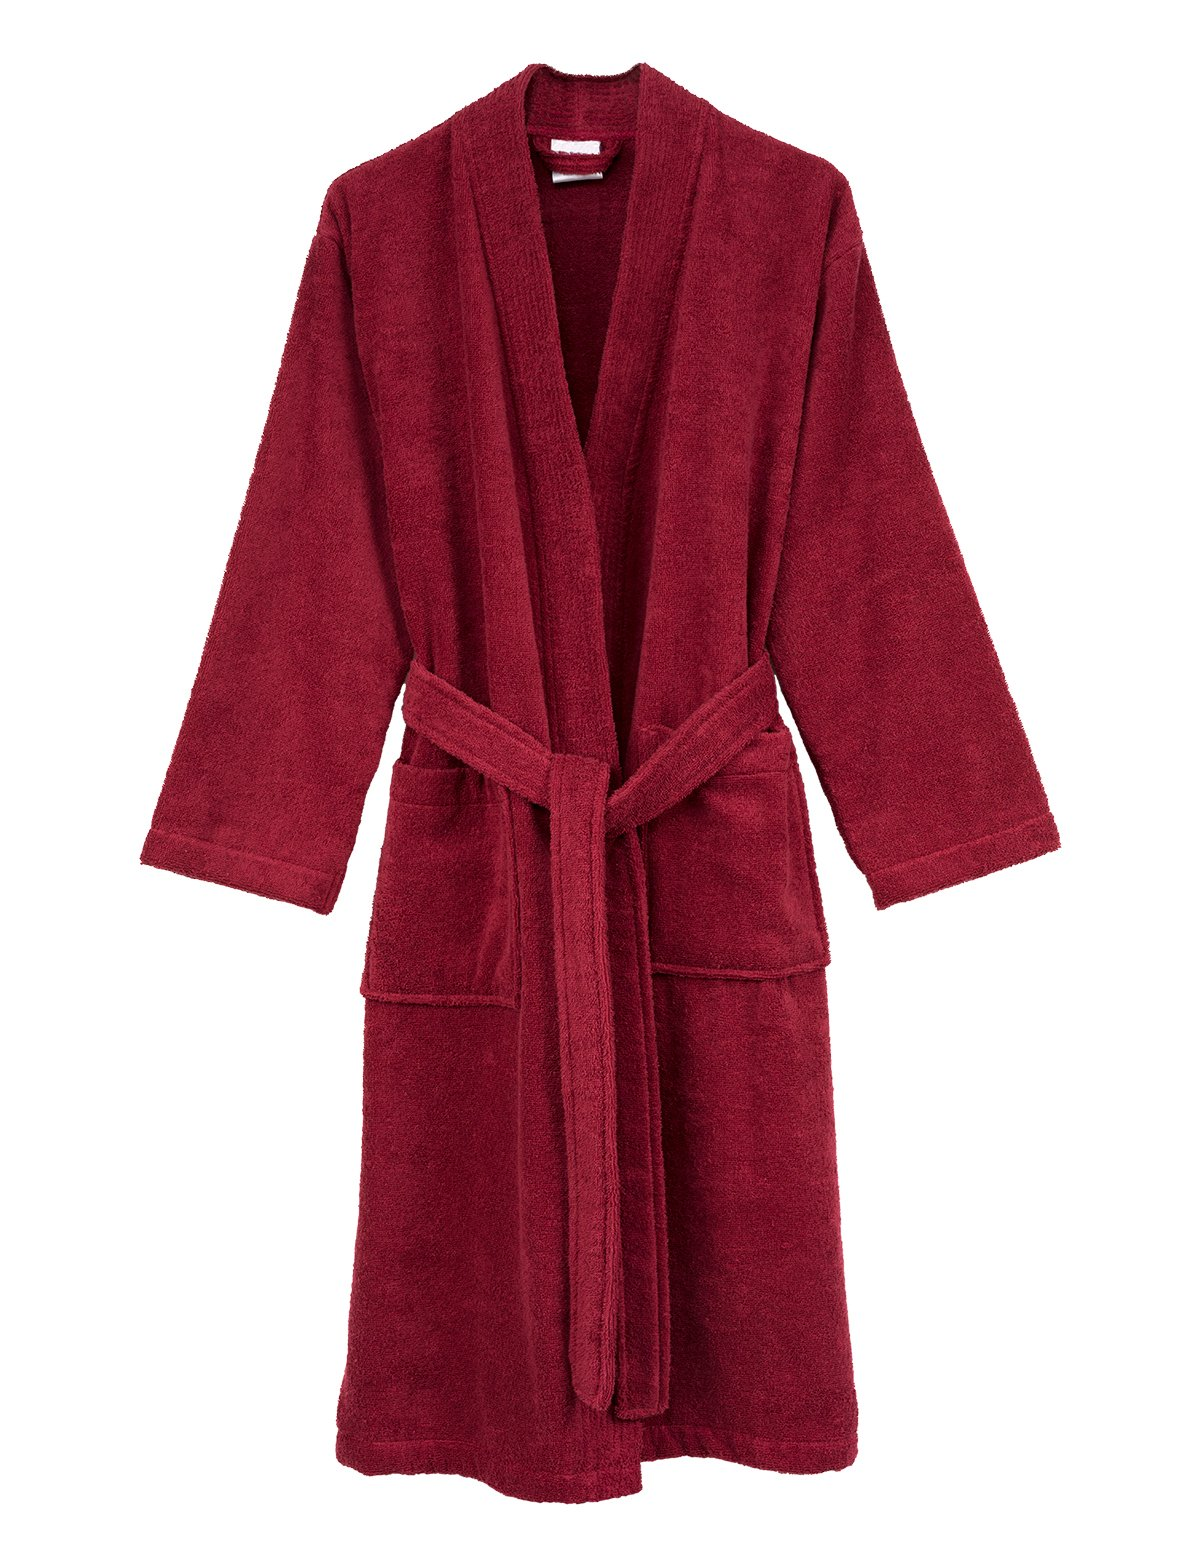 TowelSelections Men's Robe, Turkish Cotton Terry Kimono Bathrobe Large/X-Large Deep Claret